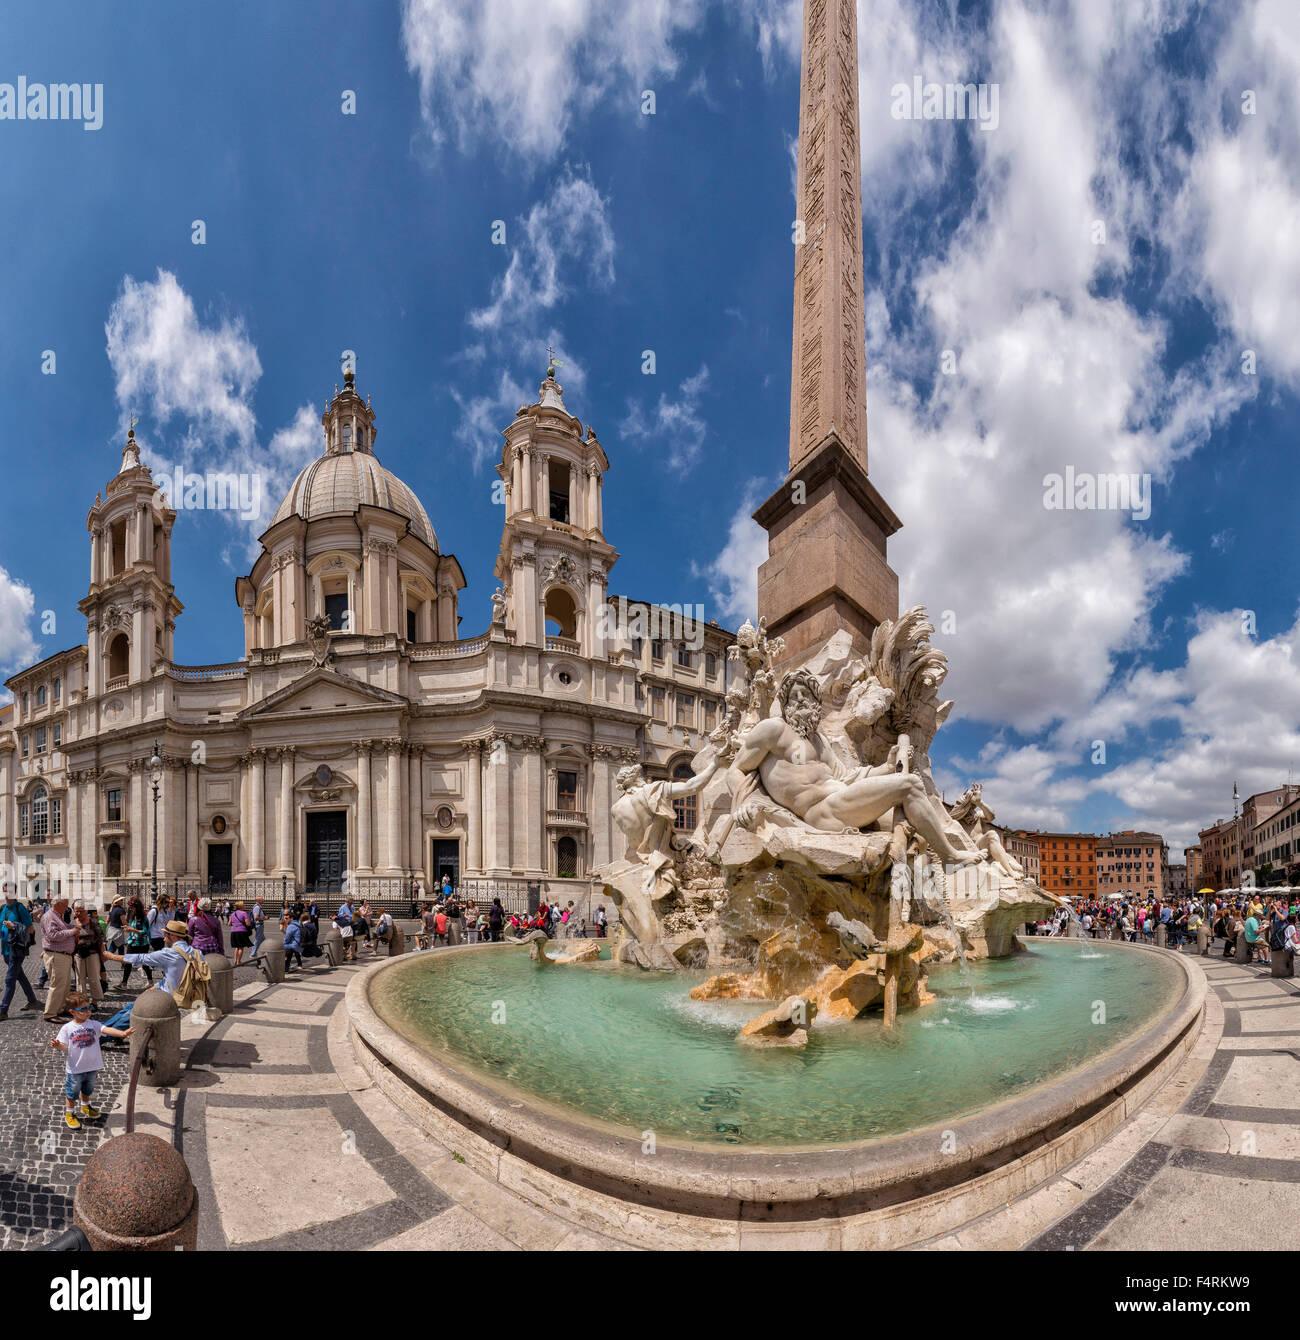 Italia, Europa, Lazio, Roma, Roma, la ciudad, la aldea, el agua, el muelle, la gente, Trevi, Piazza Navona, Sant'Agnese Imagen De Stock